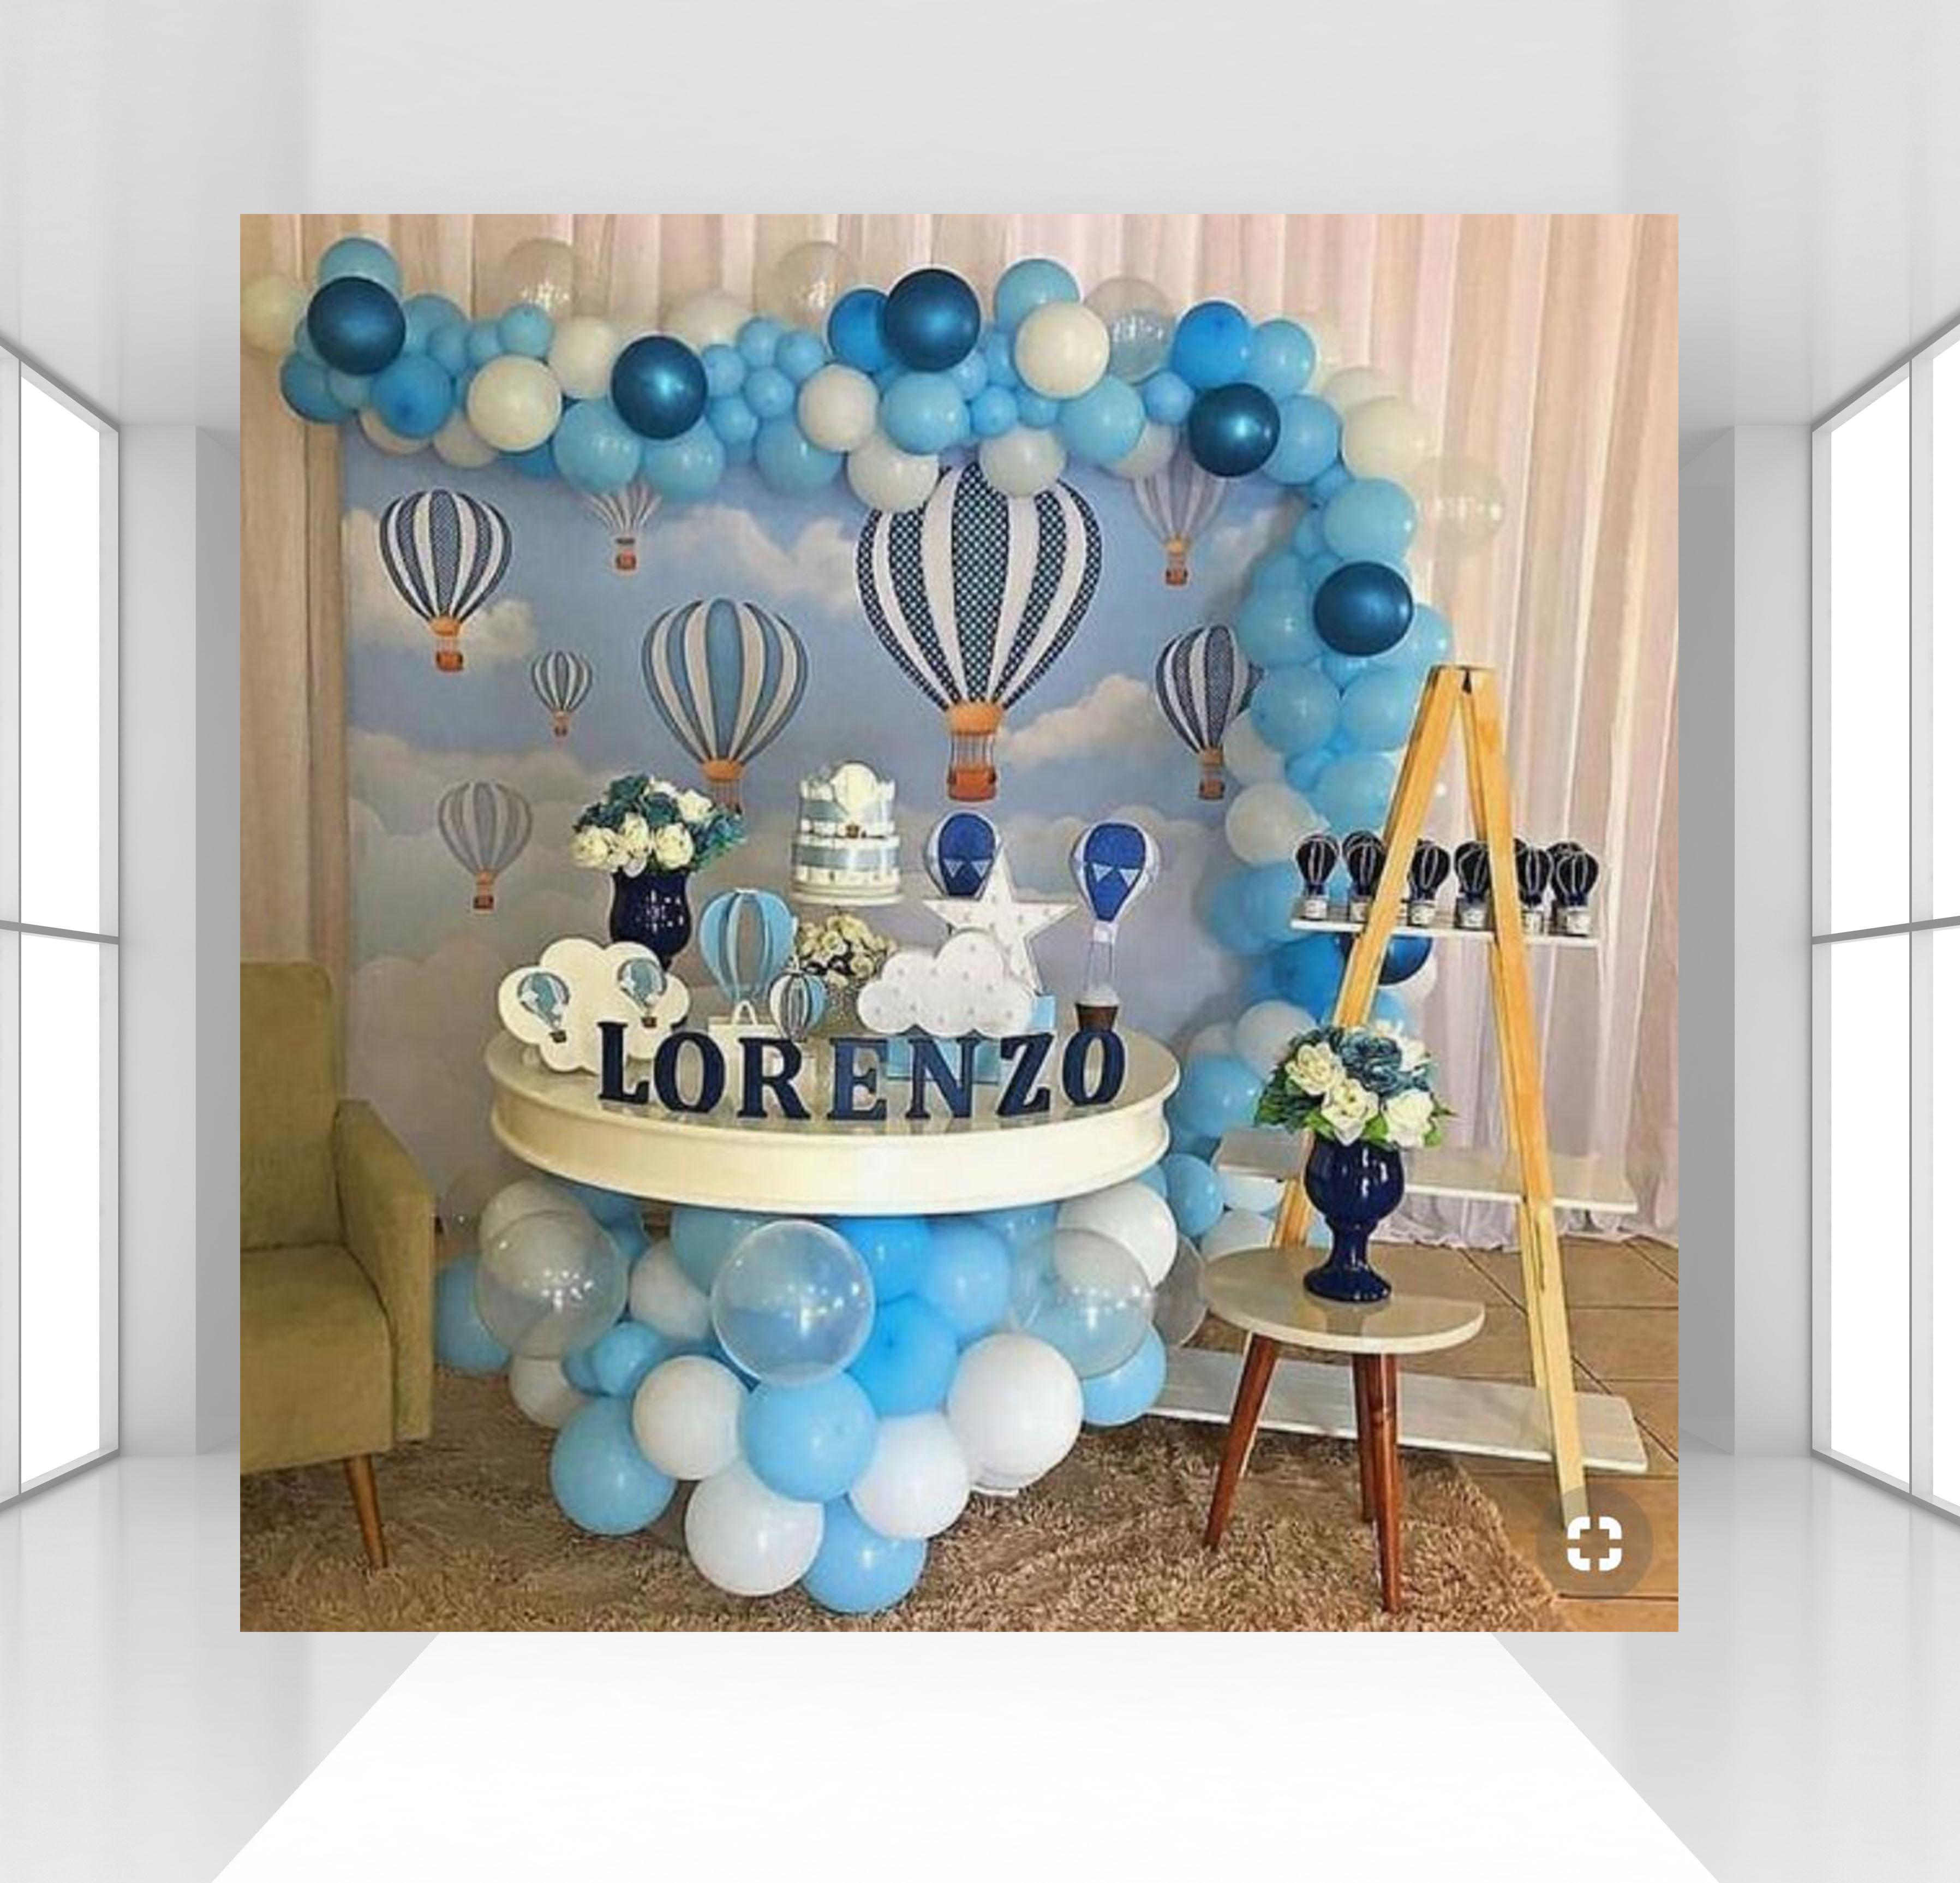 Pleasing Huayi Customized Boy Birthday Cake Smash Decorations Backdrop Funny Birthday Cards Online Necthendildamsfinfo